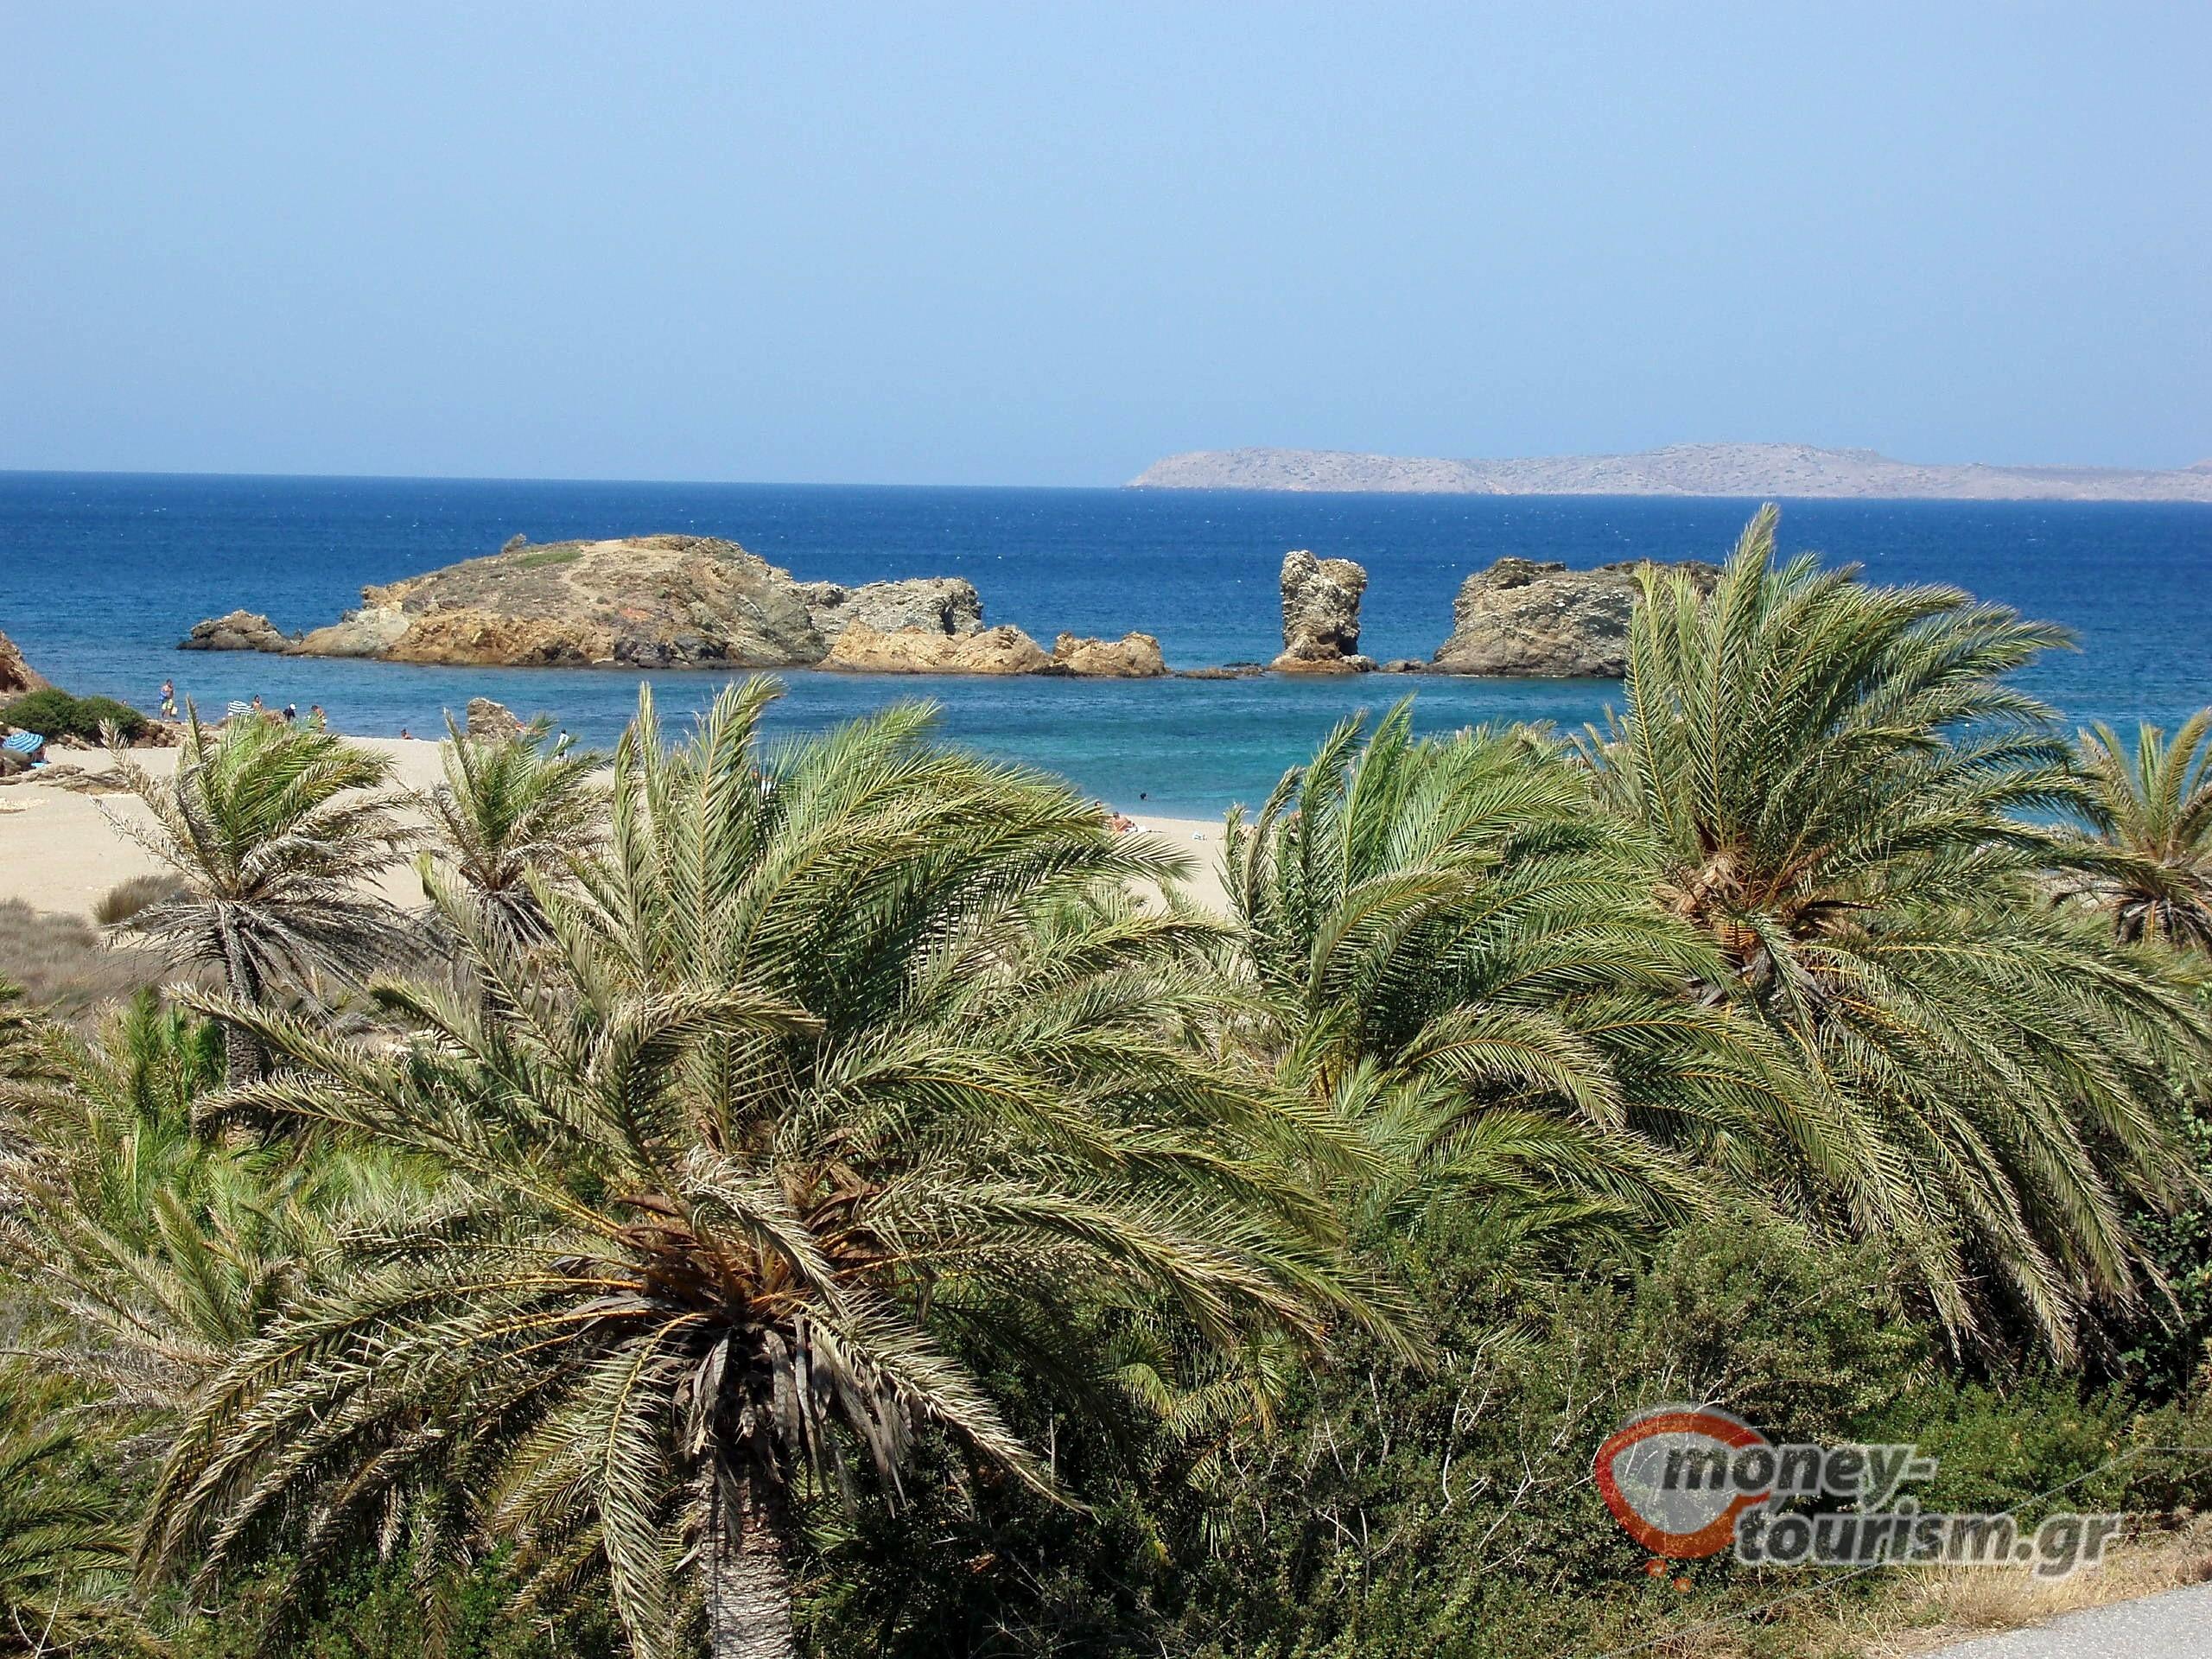 Crete gkitsakis Κρήτη